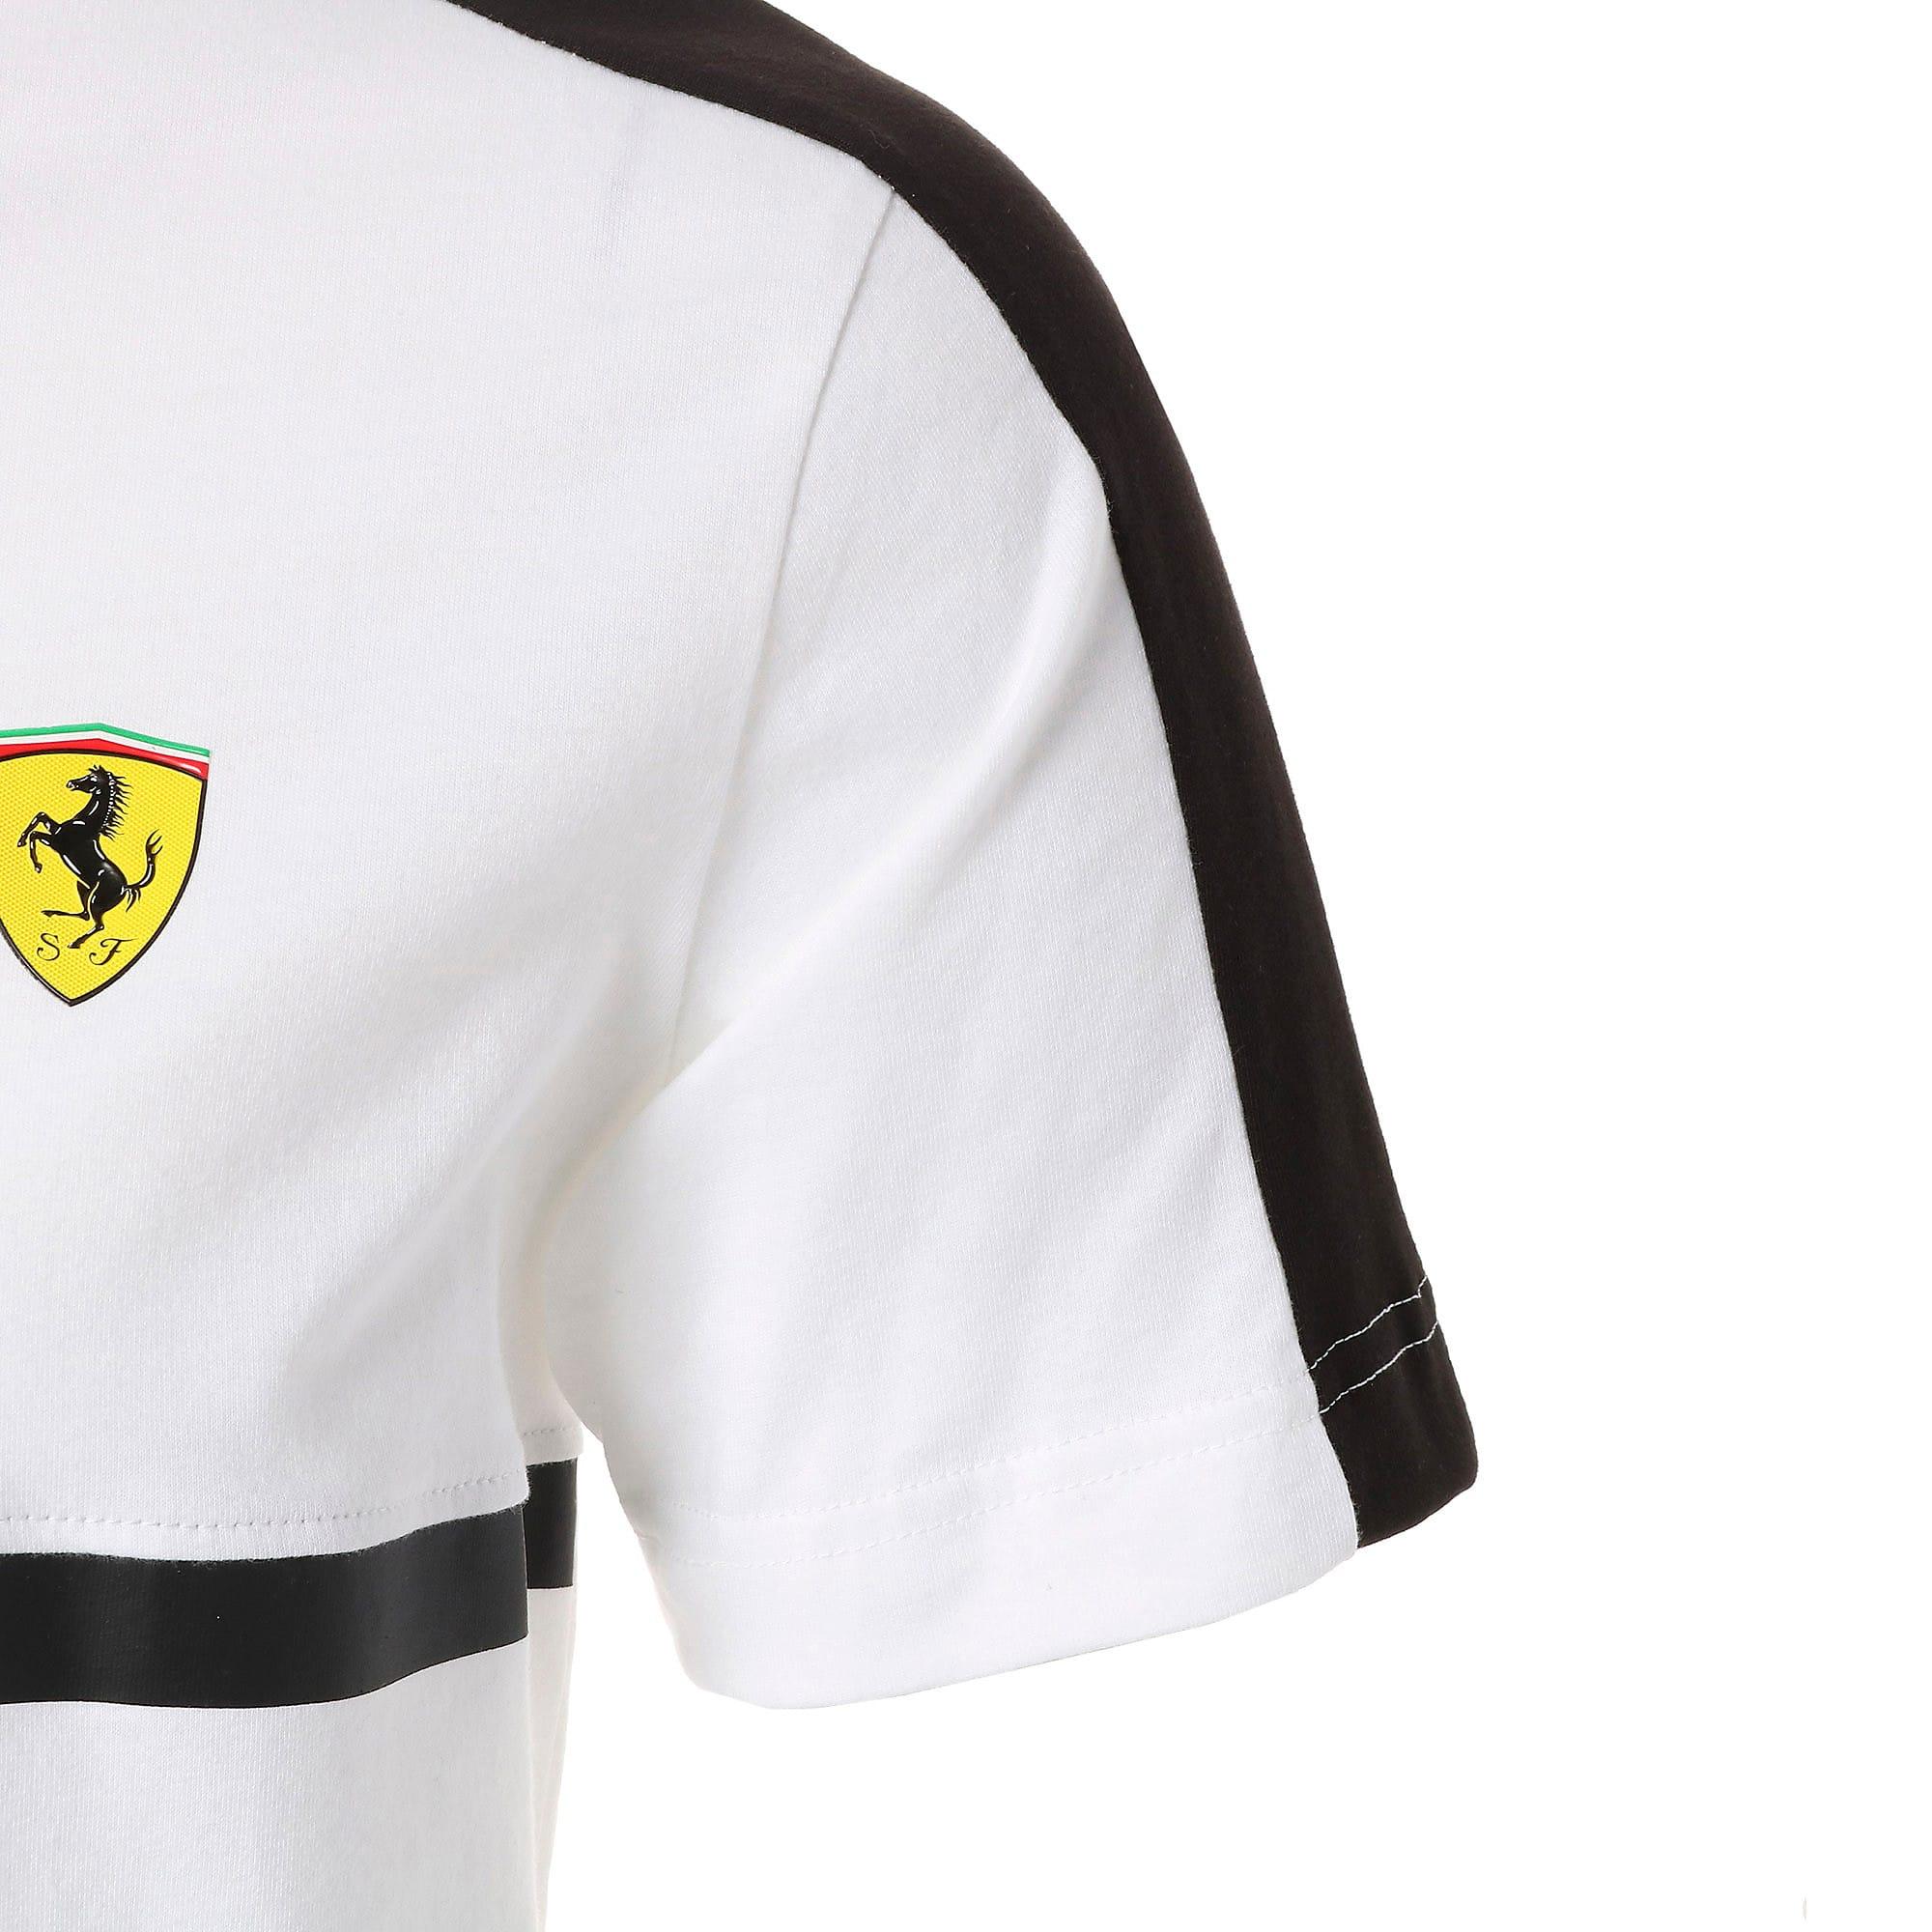 Thumbnail 4 of フェラーリ T7 Tシャツ, Puma White, medium-JPN